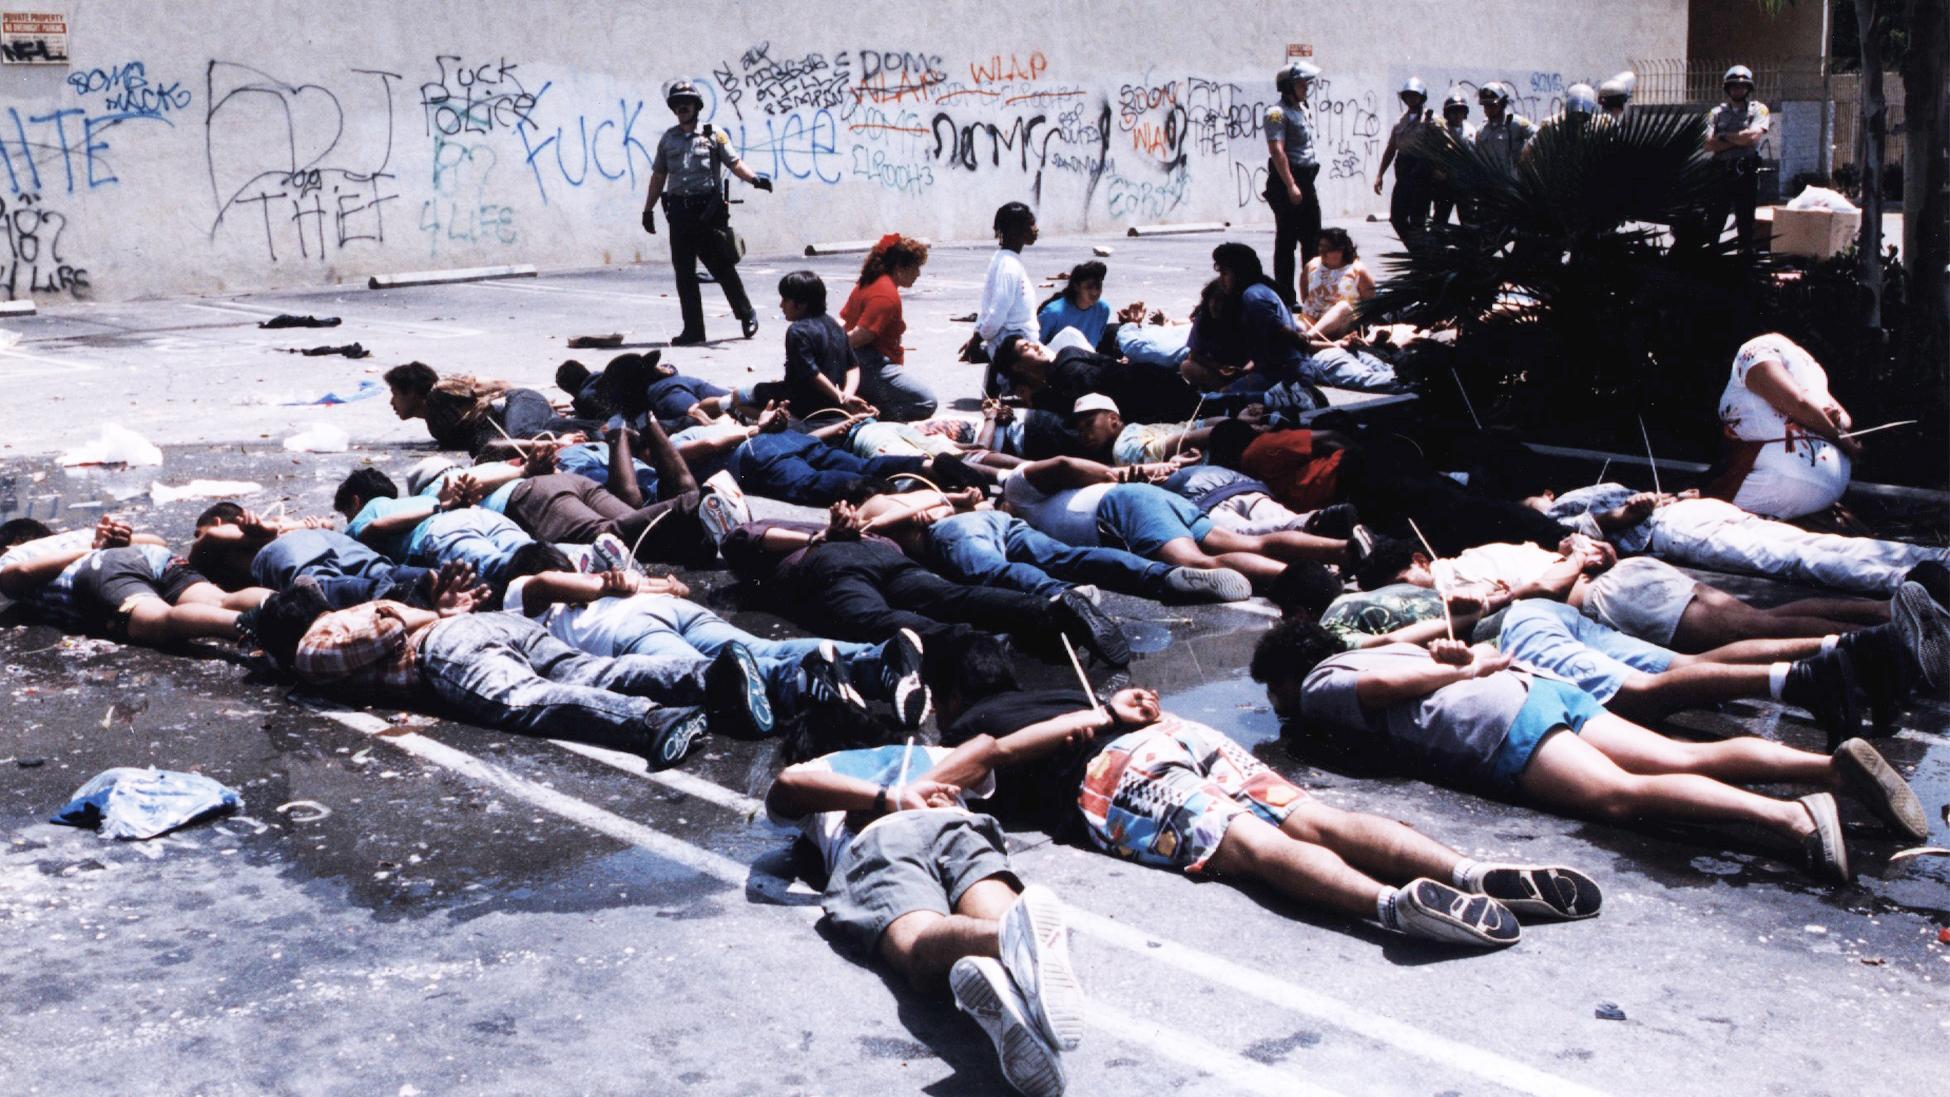 riots in california